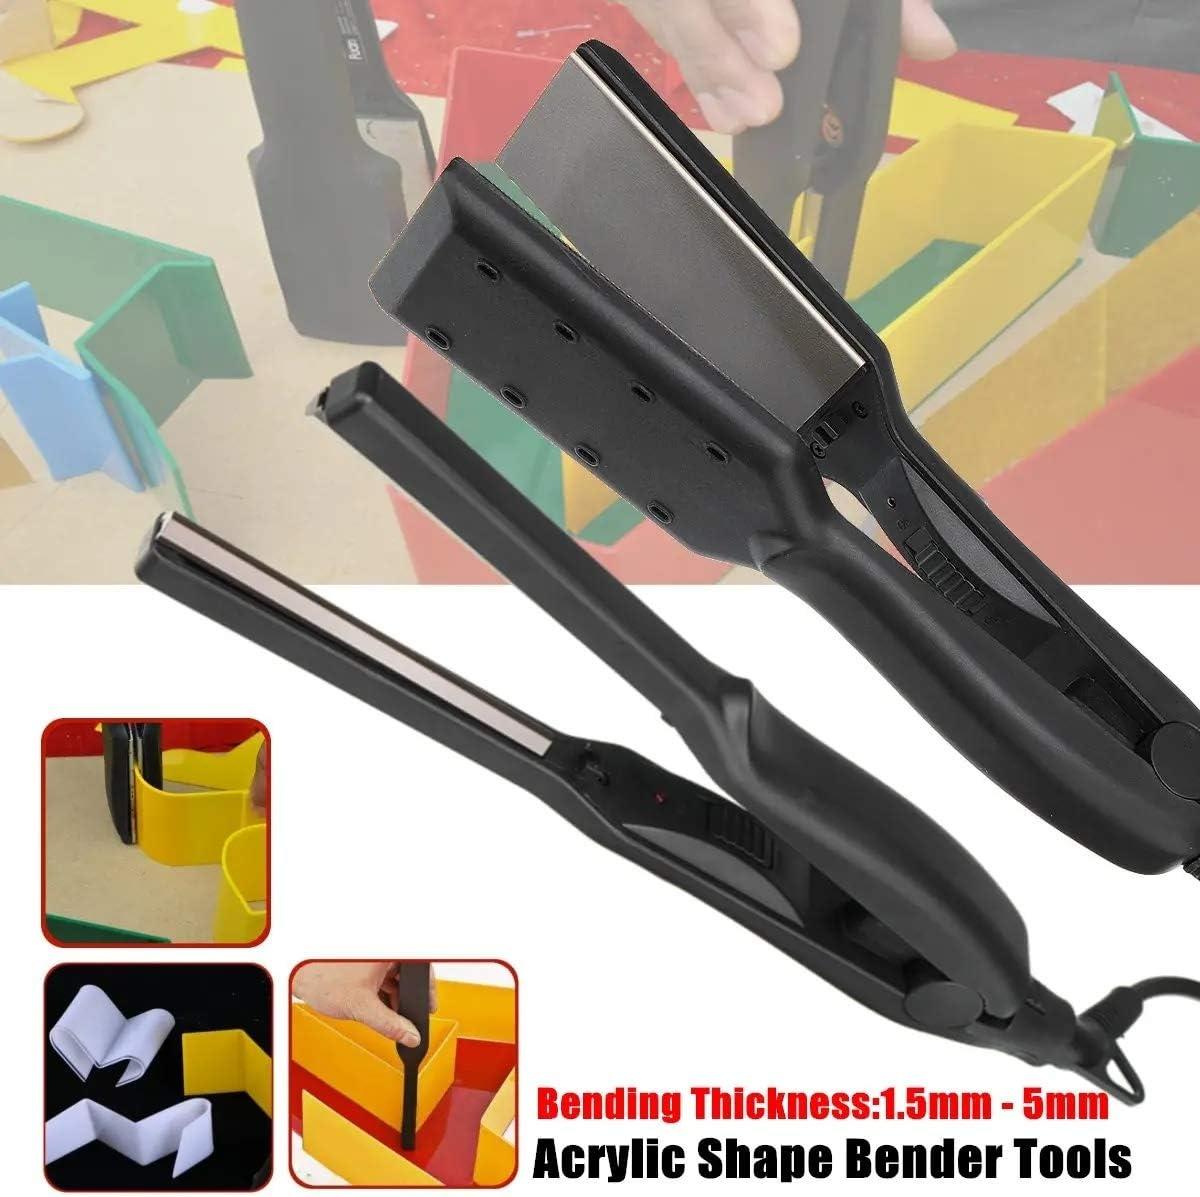 Electric Hot Bending Machine Curved Arc Luminous Word Hardware Tools Kit Set Acrylic Hot Bending Machine Bender Edge Tool DIY Tool Kit